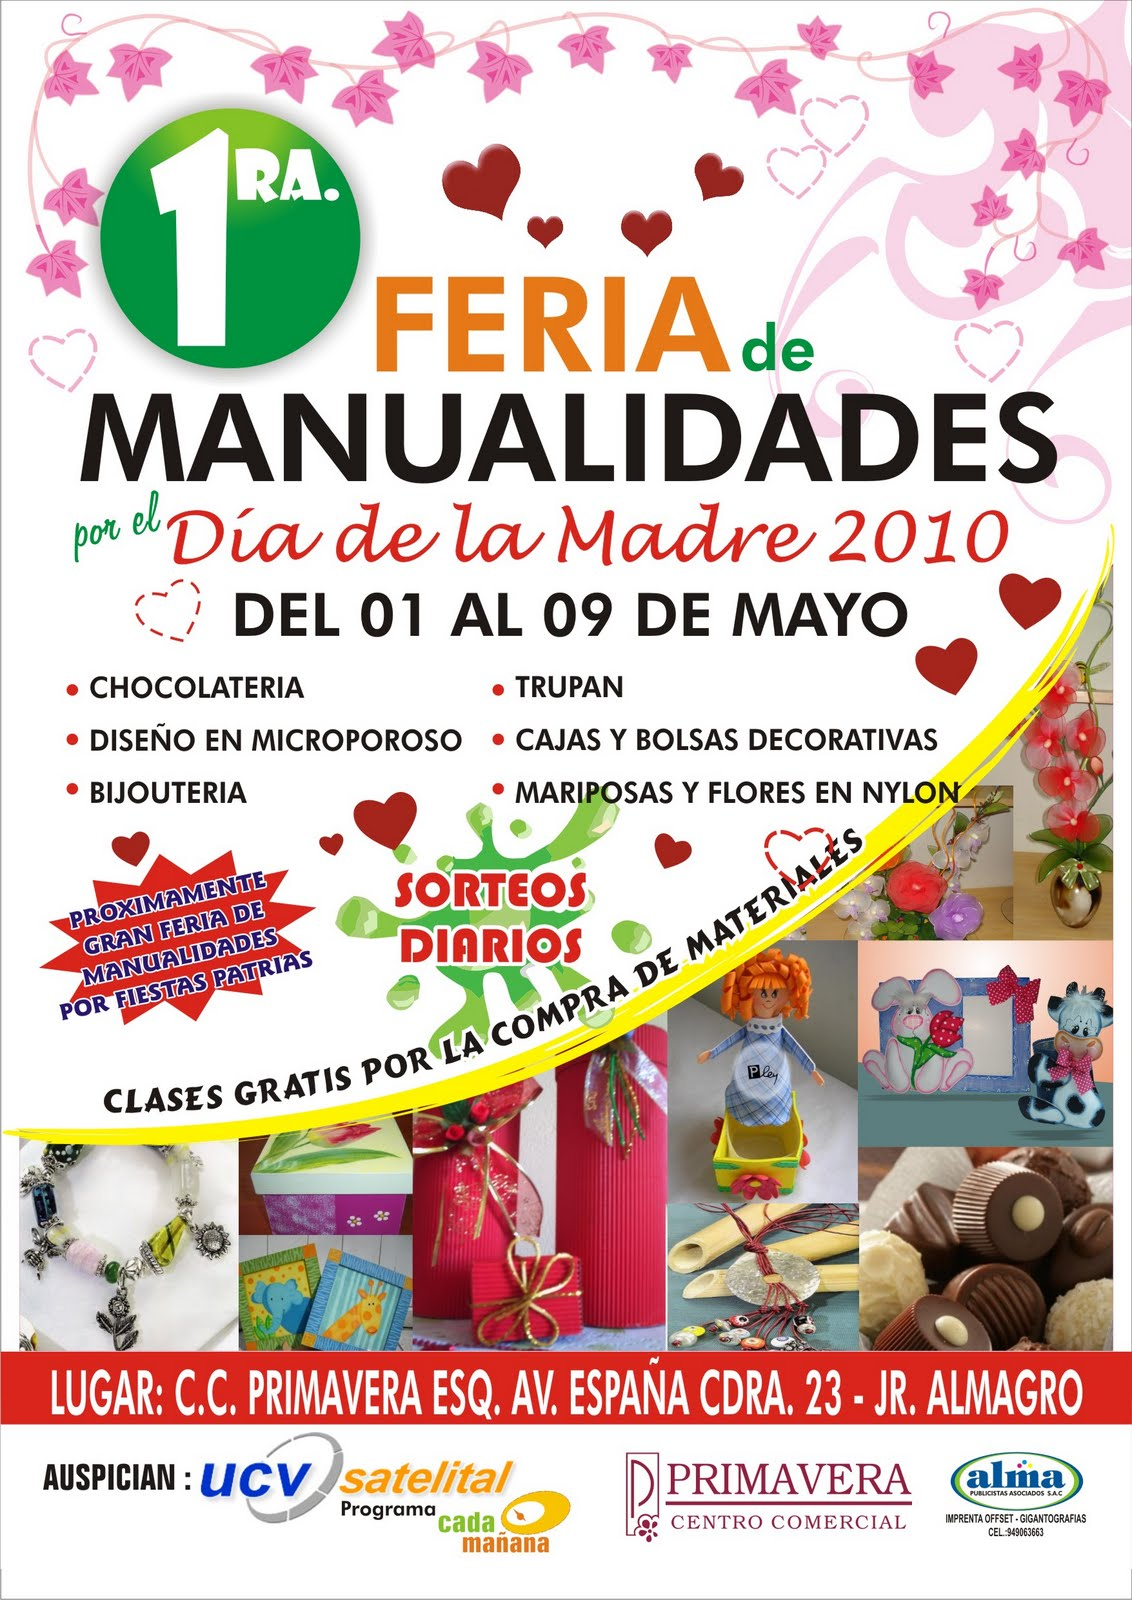 1 feria de manualidades por el d a de la madre agenda - Feria de manualidades en barcelona ...